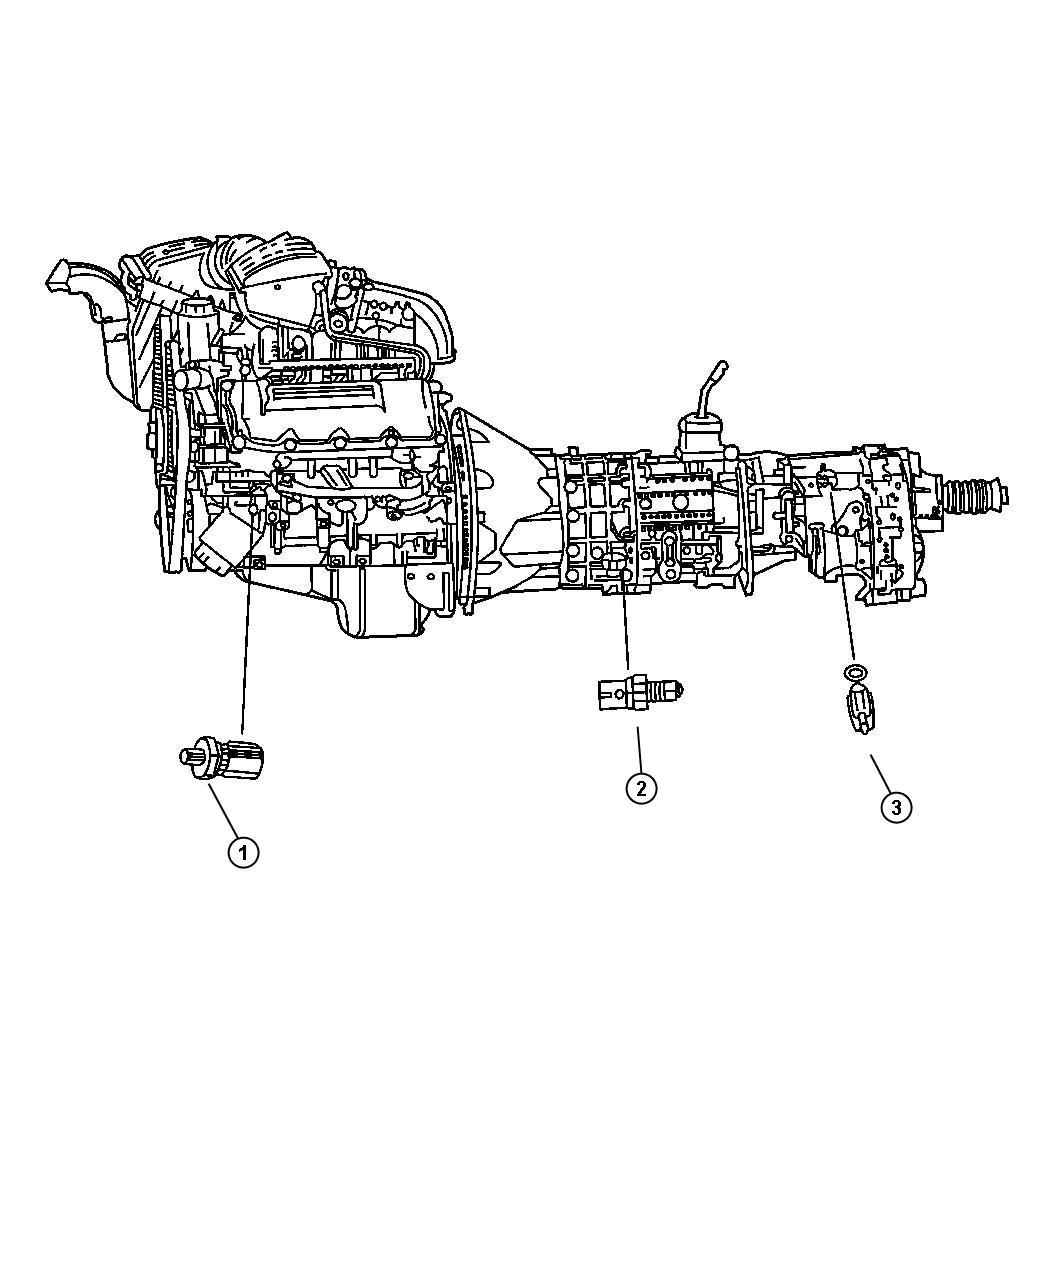 Jeep Grand Cherokee Limited 4 7l V8 Mpi 5 Spd